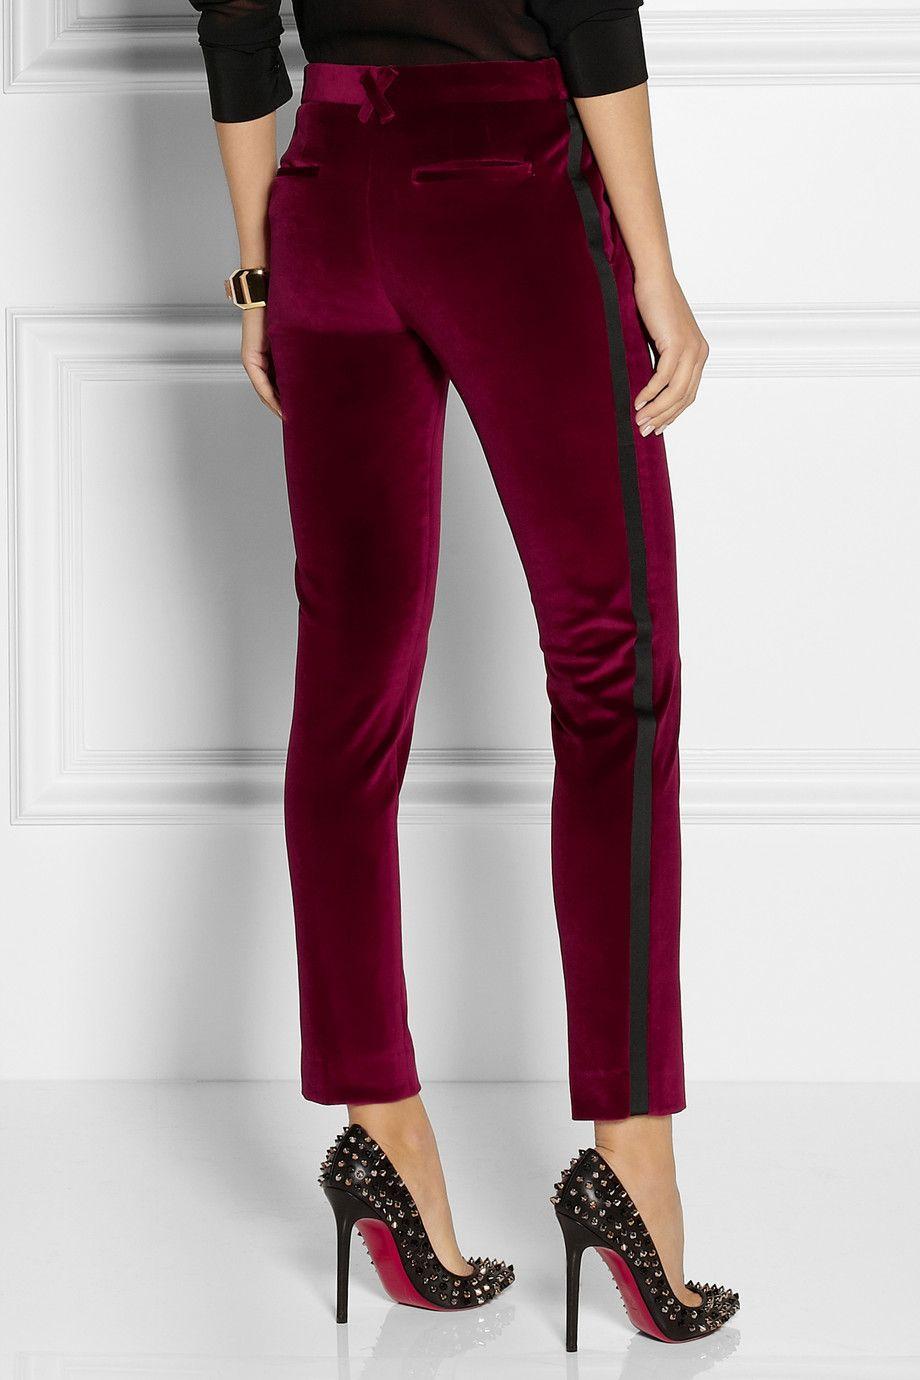 1d3e6862e42 EACH X OTHER   Satin-trimmed velvet tuxedo pants   clothes with ...